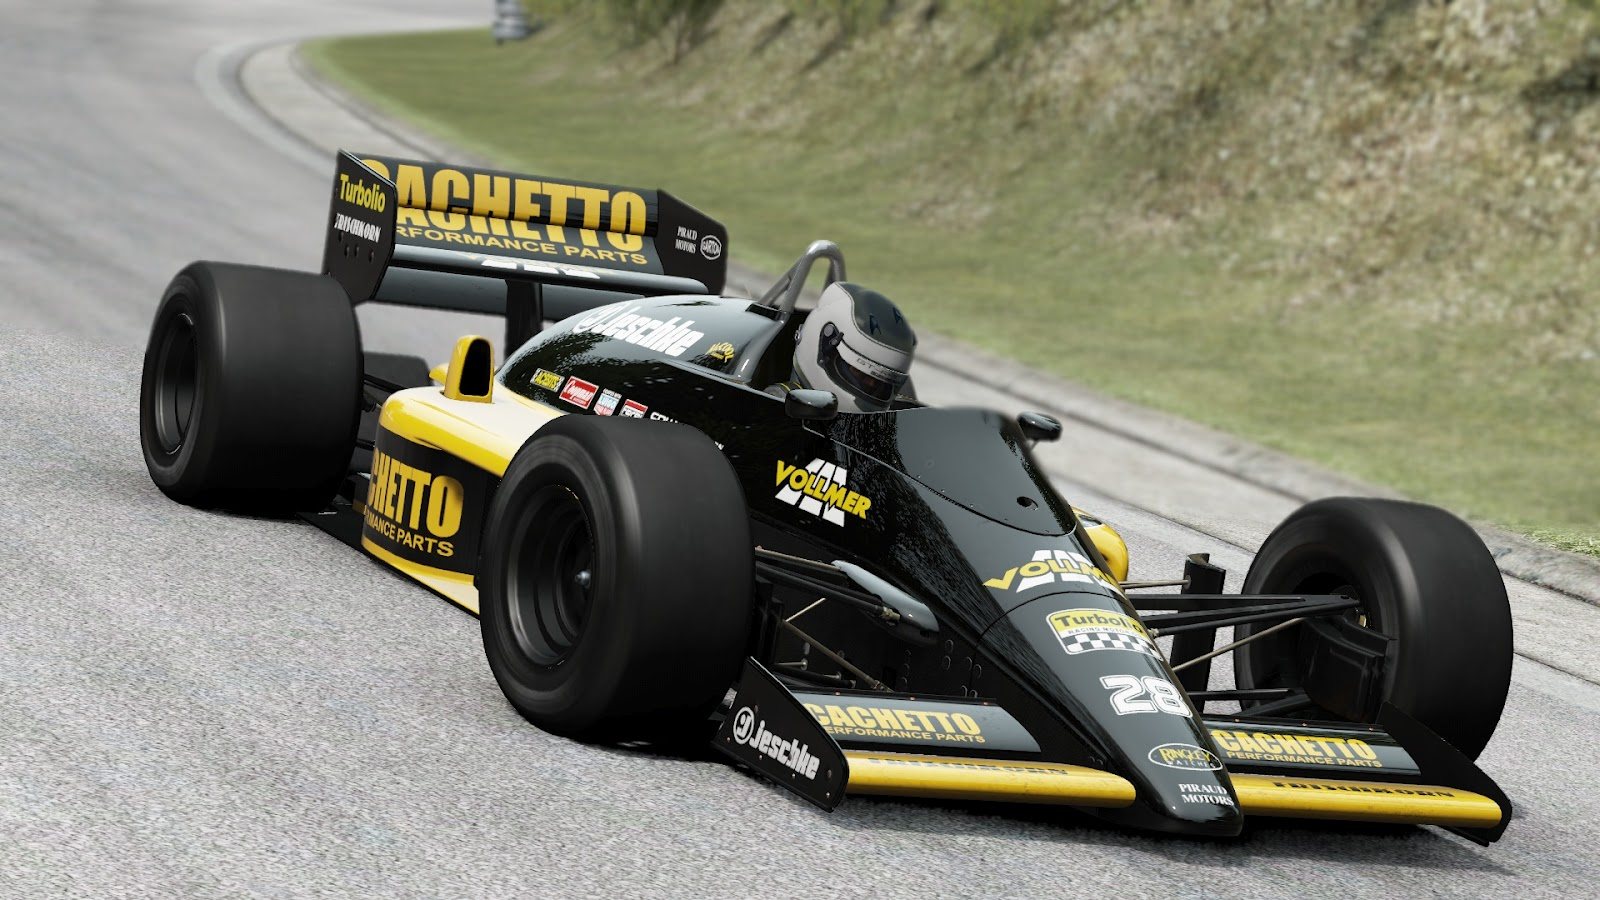 Project CARS: Fantasztikus grafika és F1-es élmény